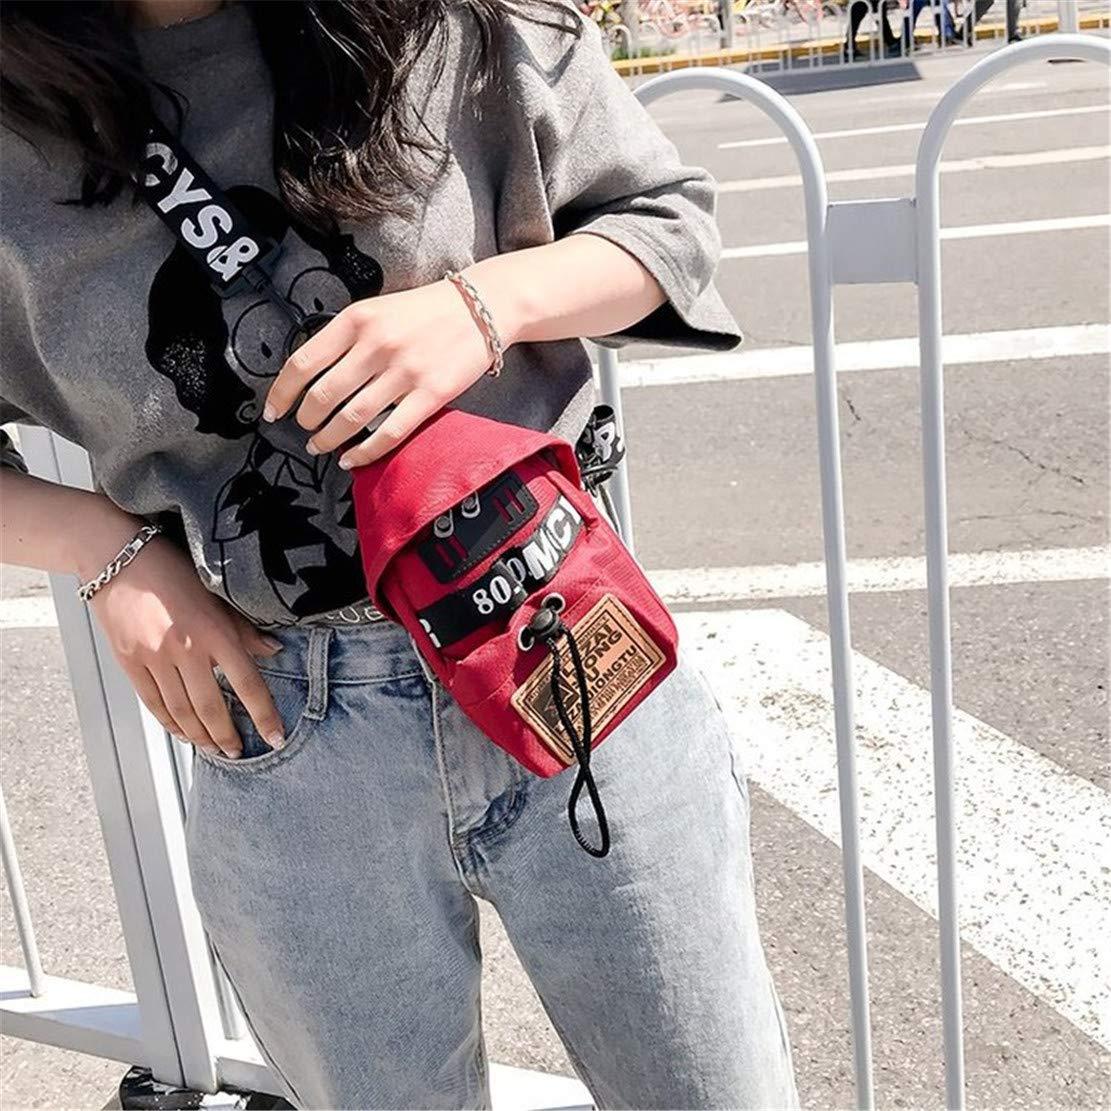 Skitor Bolso del Pecho Mujer Estampados Guapo Bolso de Honda Peque/ña Impermeable Sling Messenger Nylon Running Multiusos Bolso Cruzado Hombre Deportiva Moda Chest Bag Casual Bicicletas